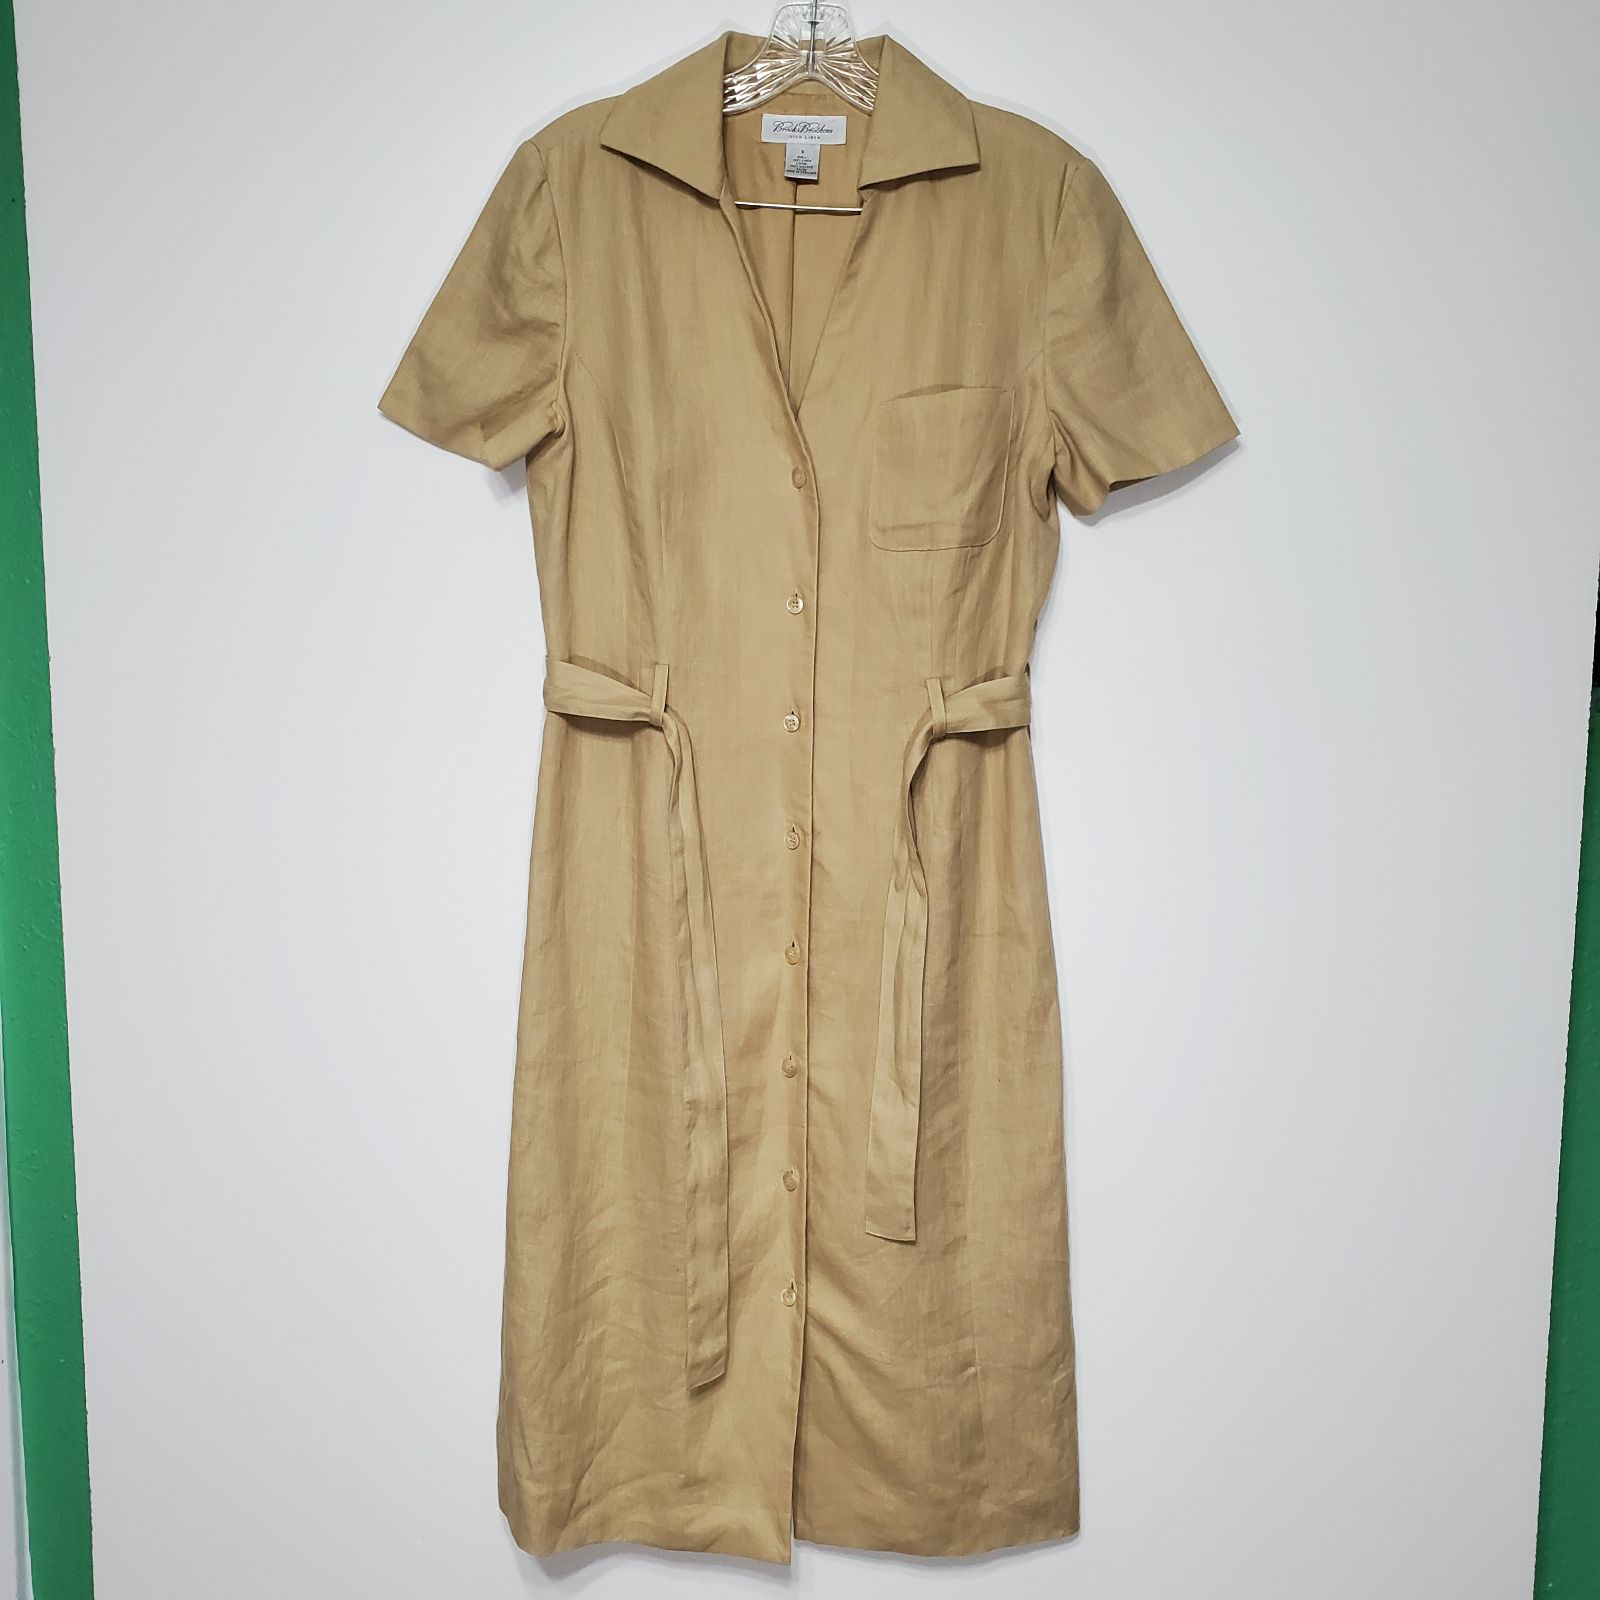 Brooks Brothers 6 irish linen Dress